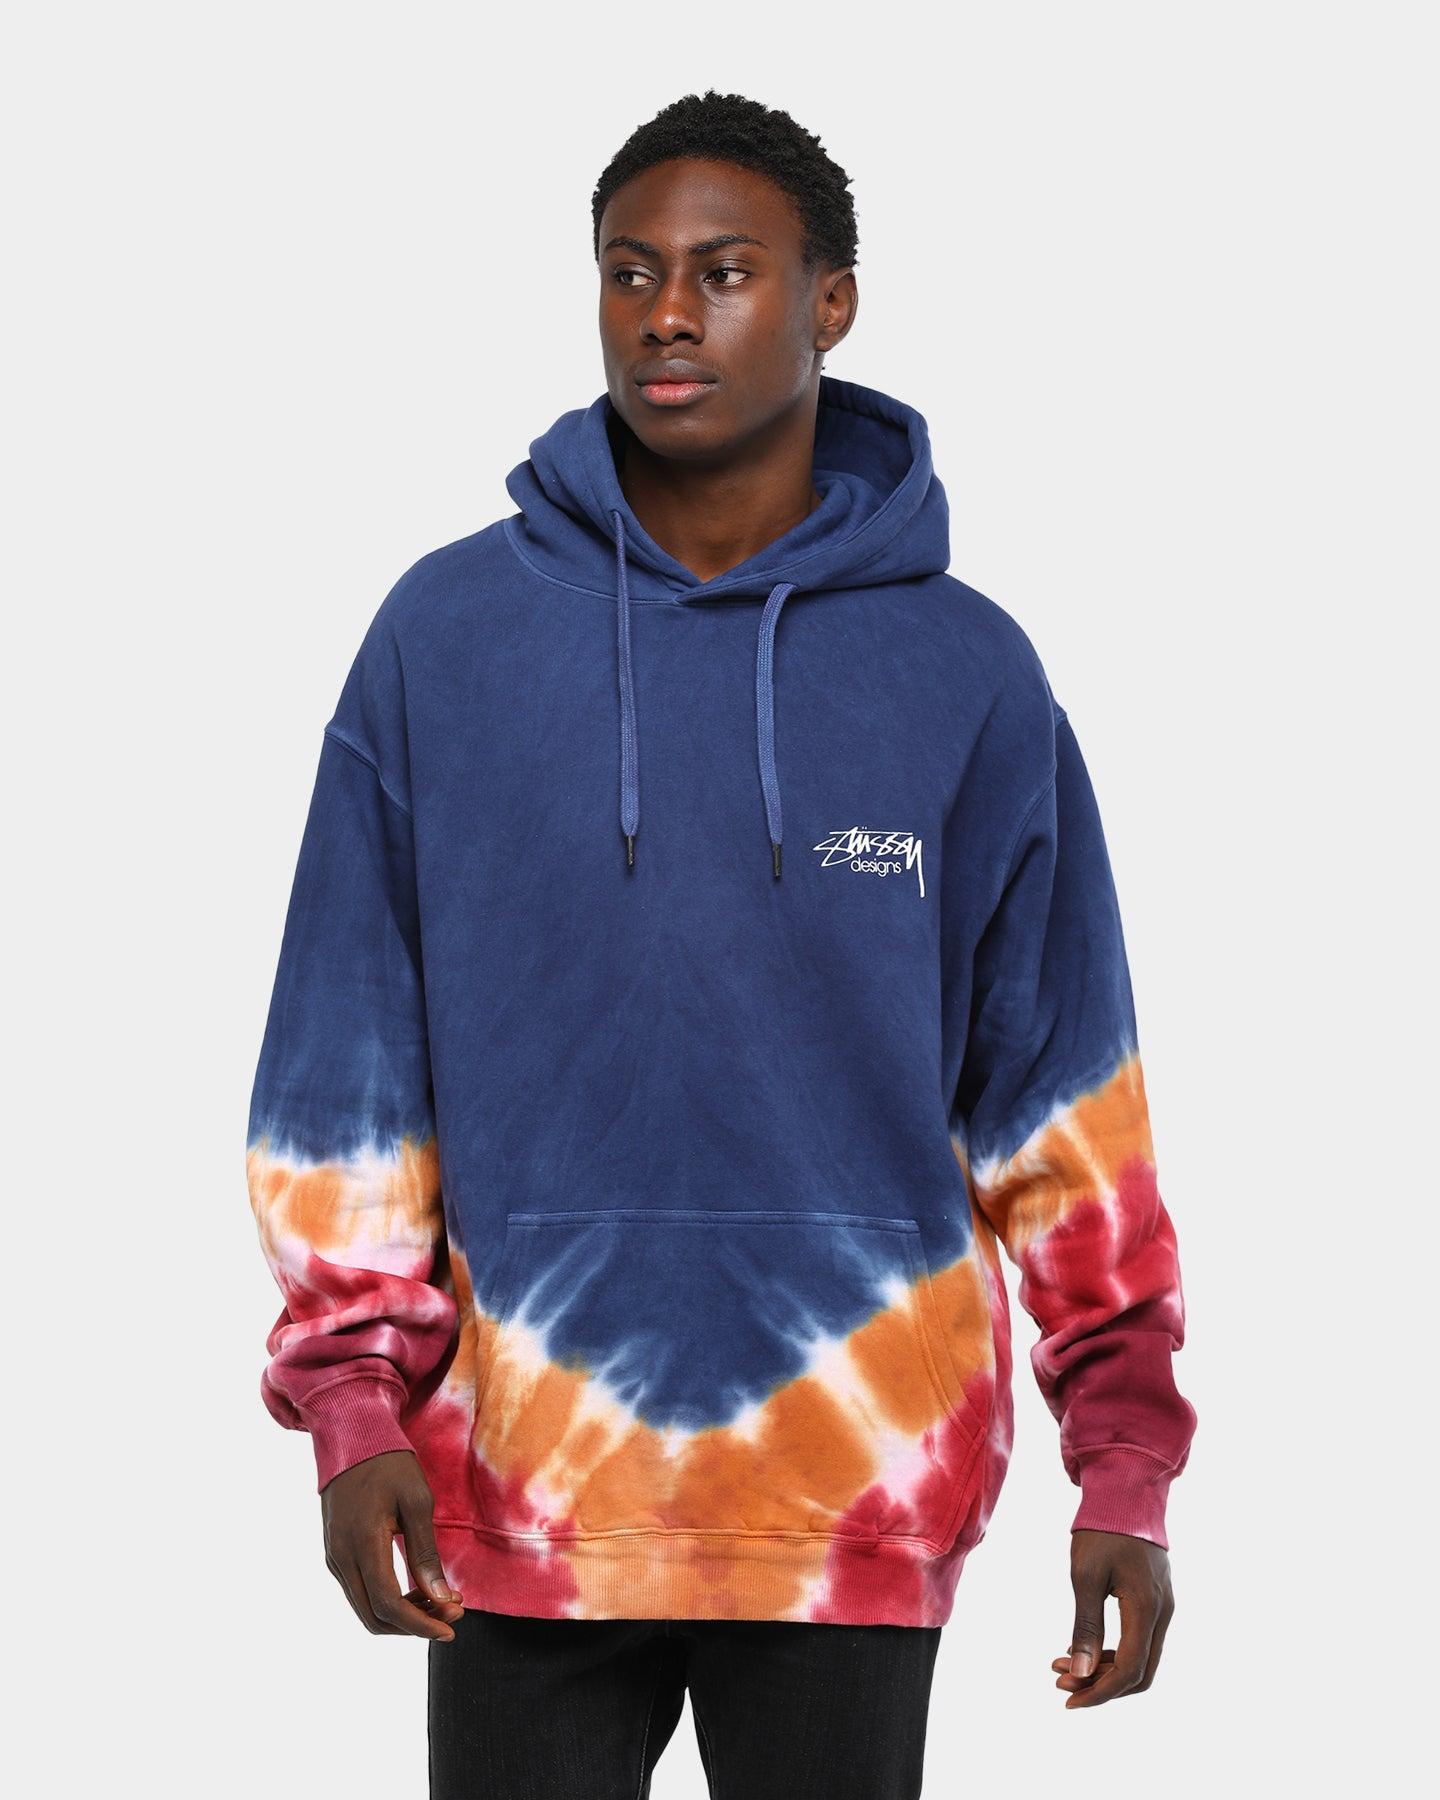 Buy ADIDAS Boys Red & Black YB SD BTS Colourblocked Hooded Puffer Jacket Apparel for Boys